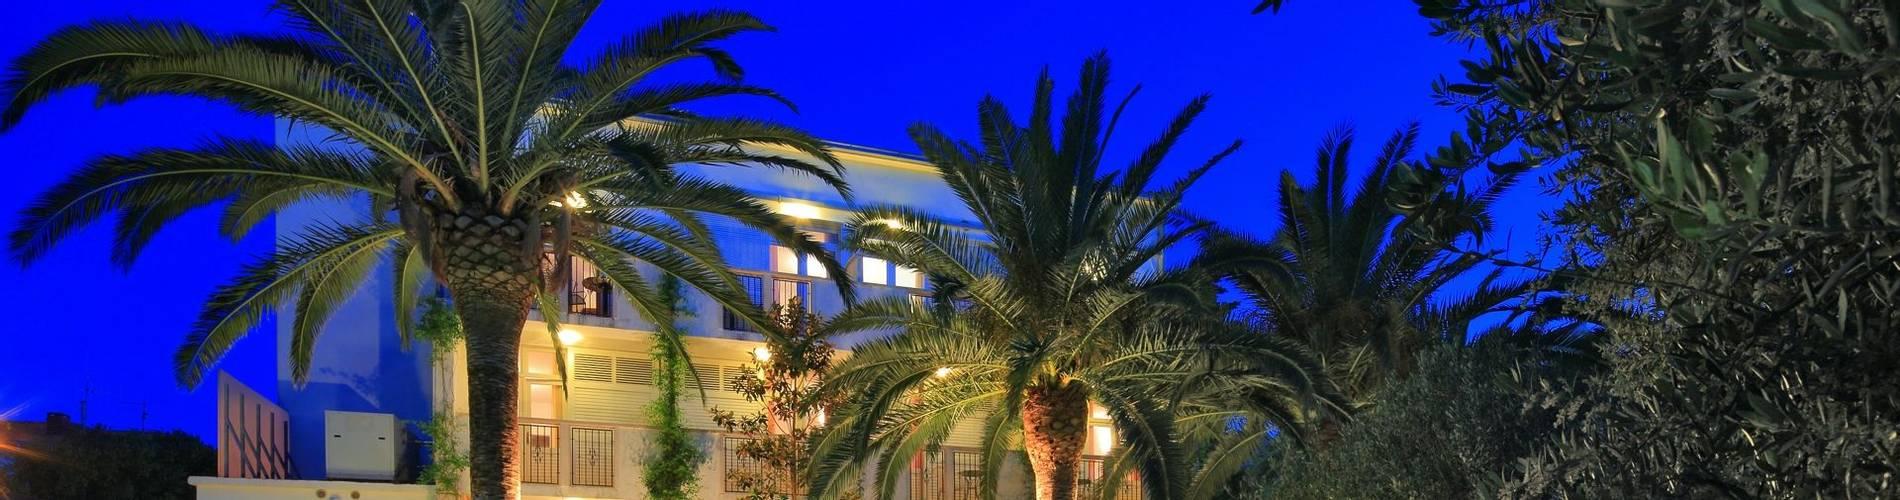 Hotel Villa ADRIATICA 2014 ZFacade 6X4 Garden Night1 17MB.jpg